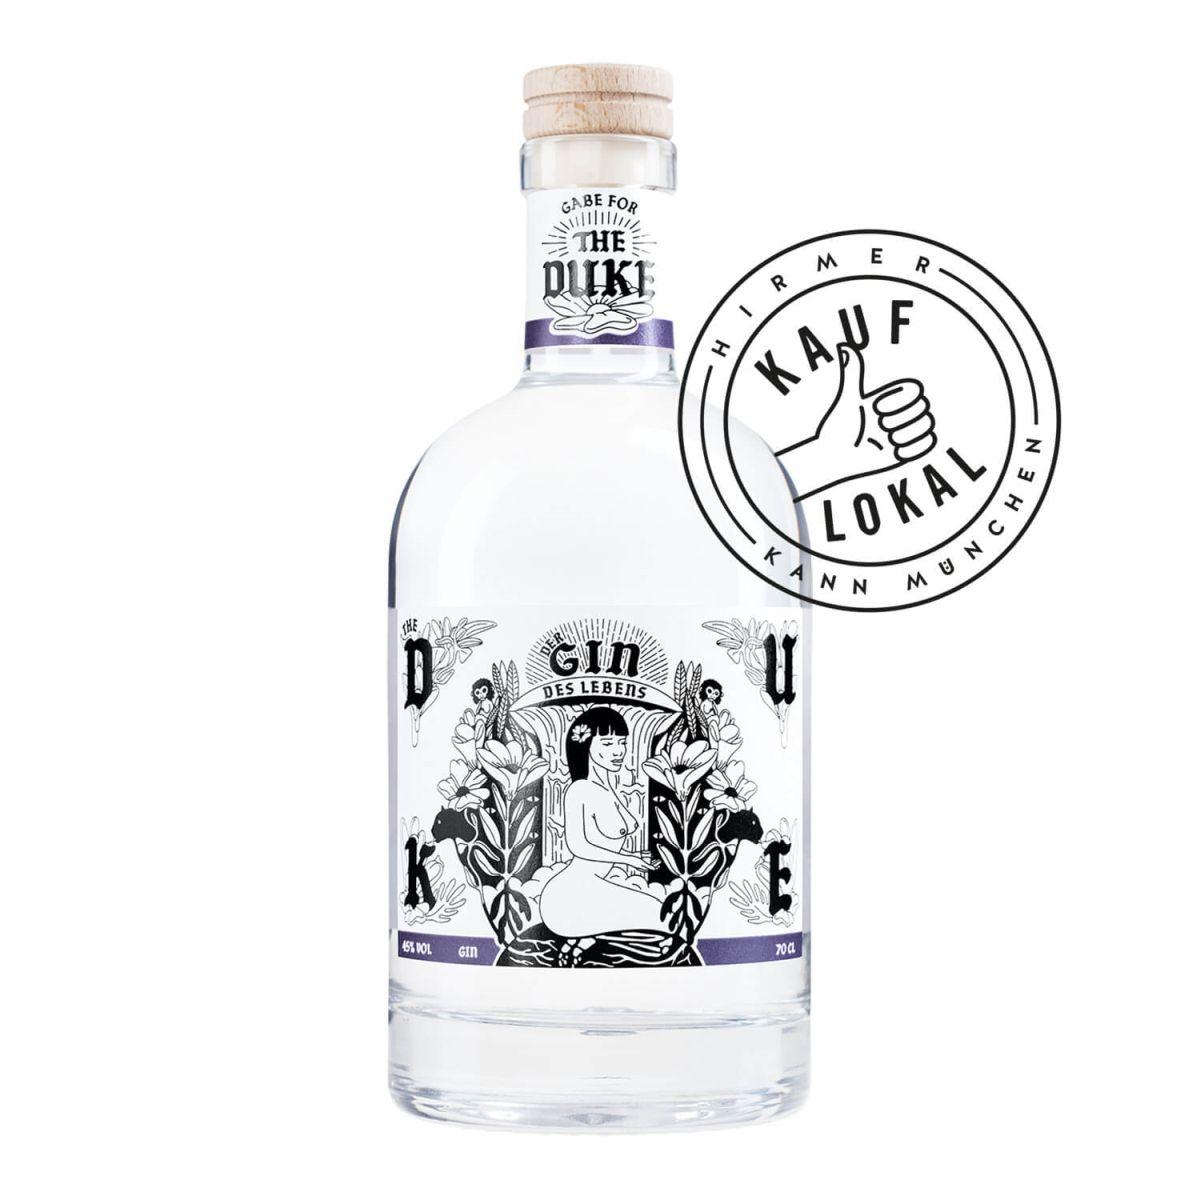 THE DUKE Gin Kunstedition Frau bei Hirmer Kauf Lokal